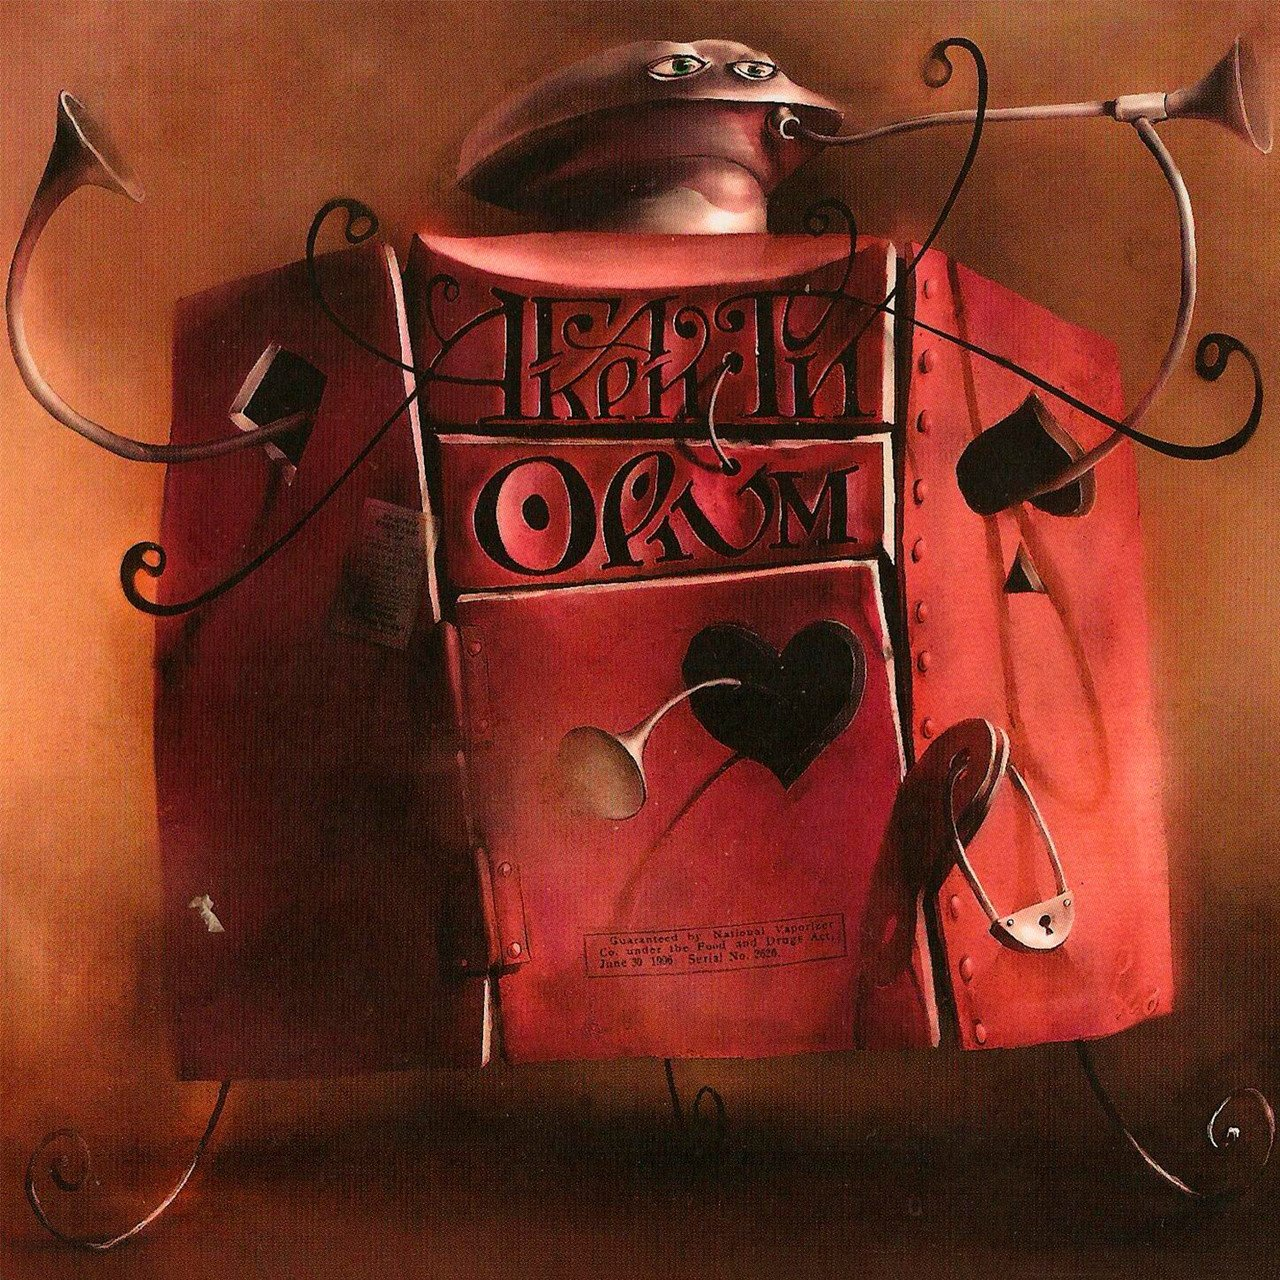 Агата Кристи - Opium (Vinyl, Lp)